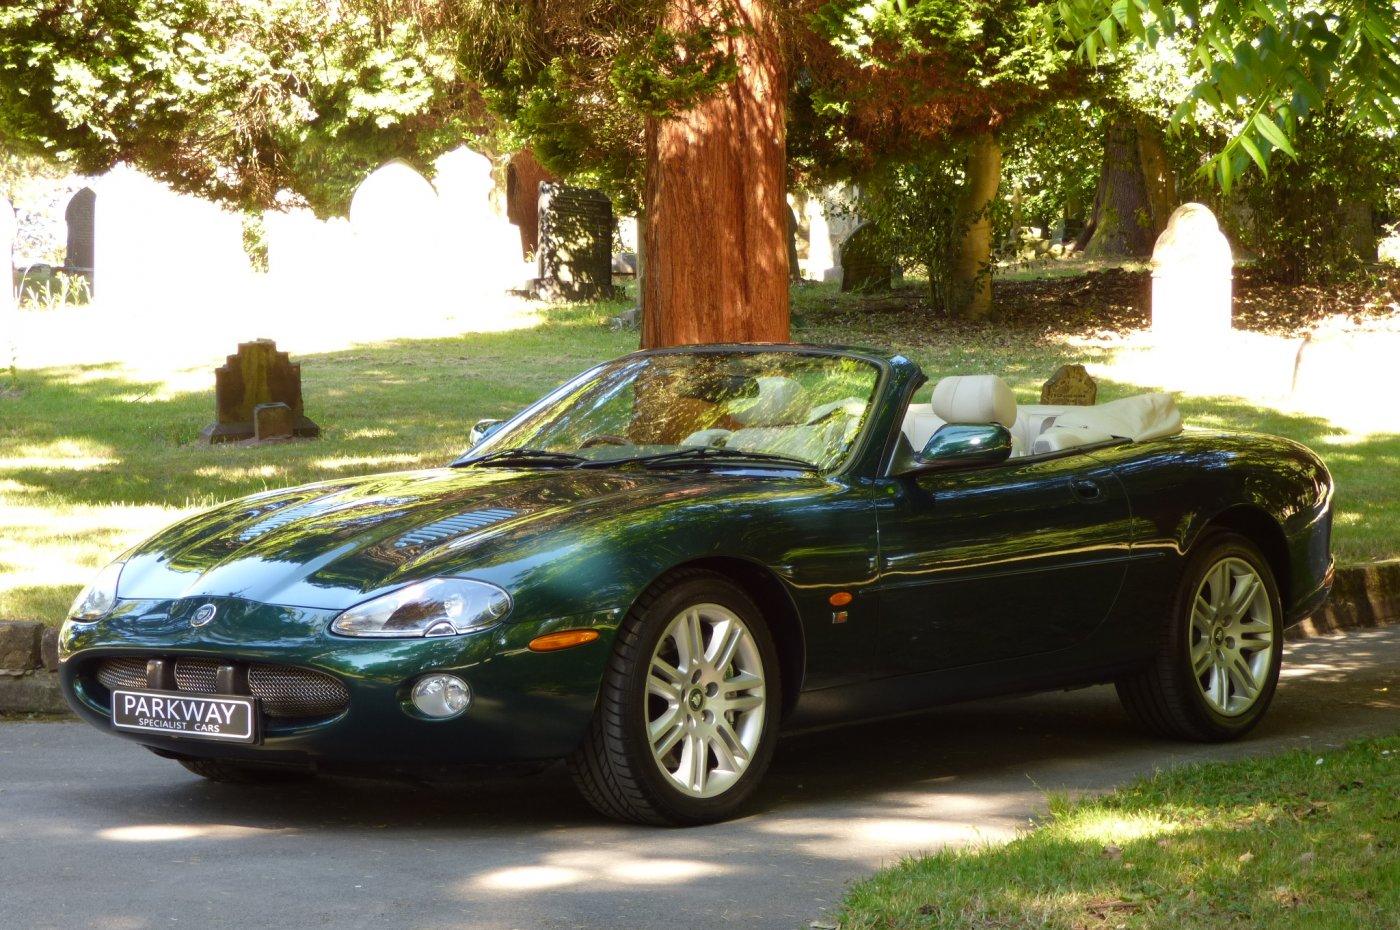 Jaguar Xkr 4 2 Convertible V8 S C